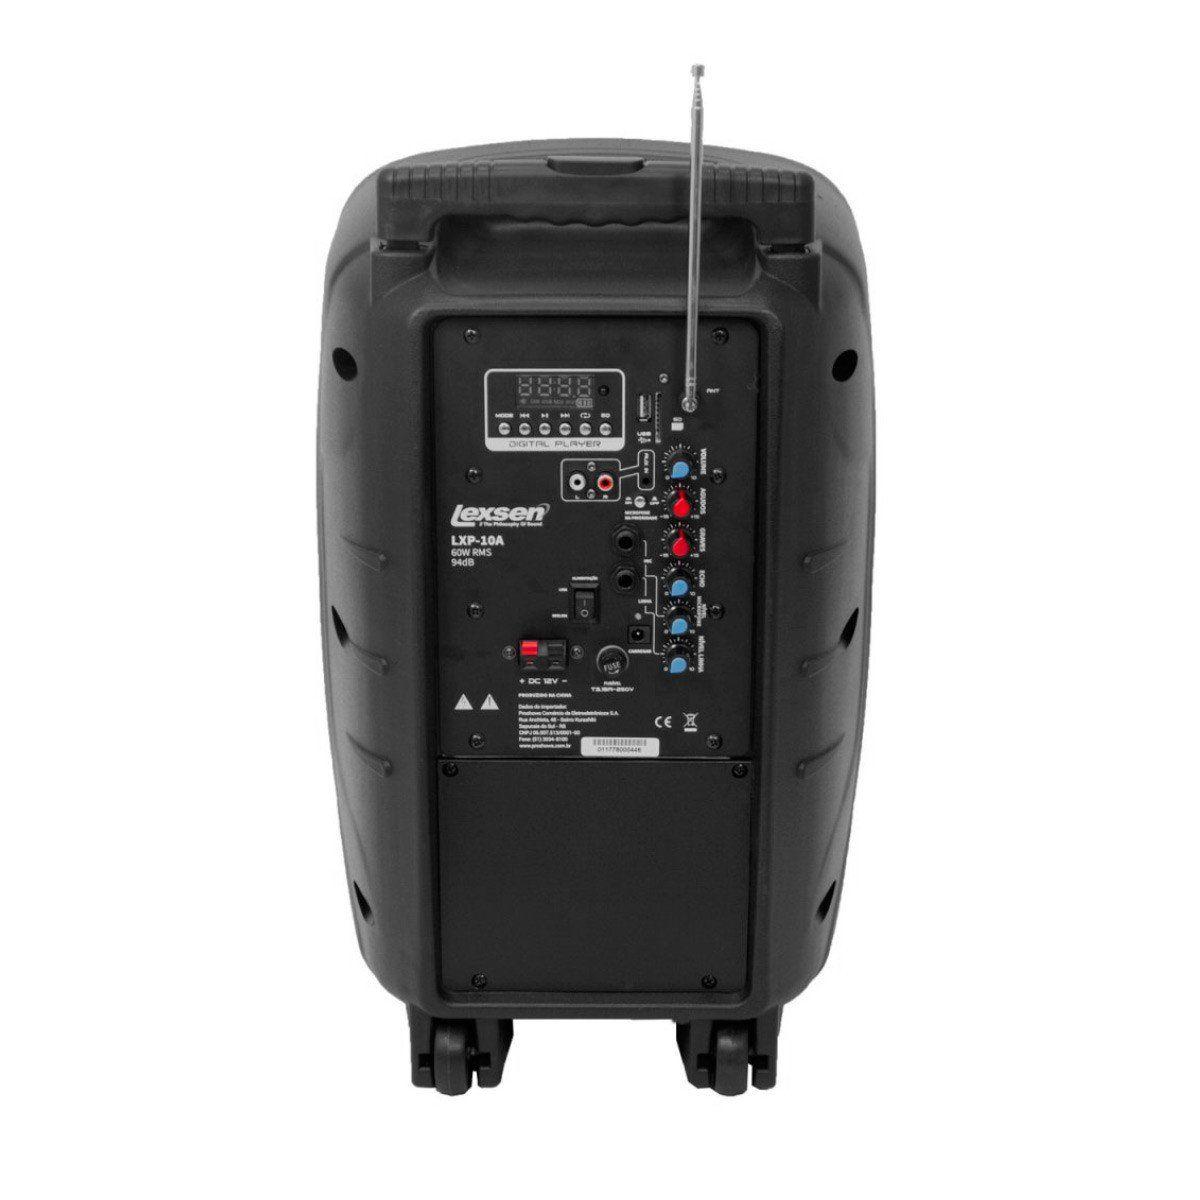 Caixa Portátil Fal 10 Pol 60W c/ USB / Bluetooth / Bateria LXP 10 A - LEXSEN